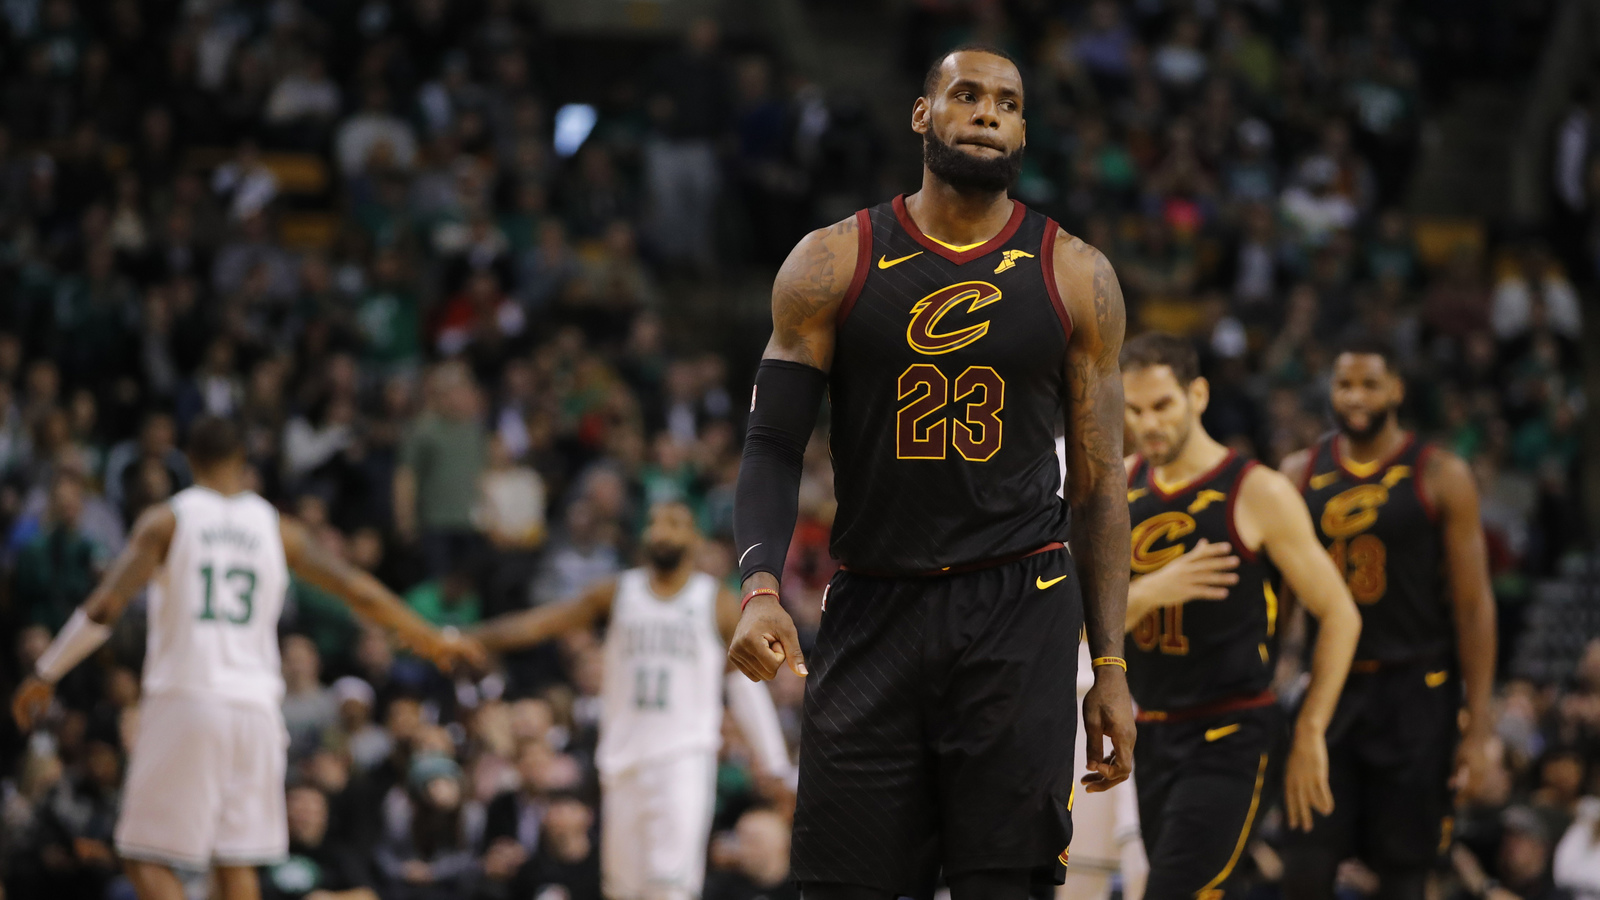 Top storylines for the Celtics-Cavaliers Eastern Conference Finals | Yardbarker.com